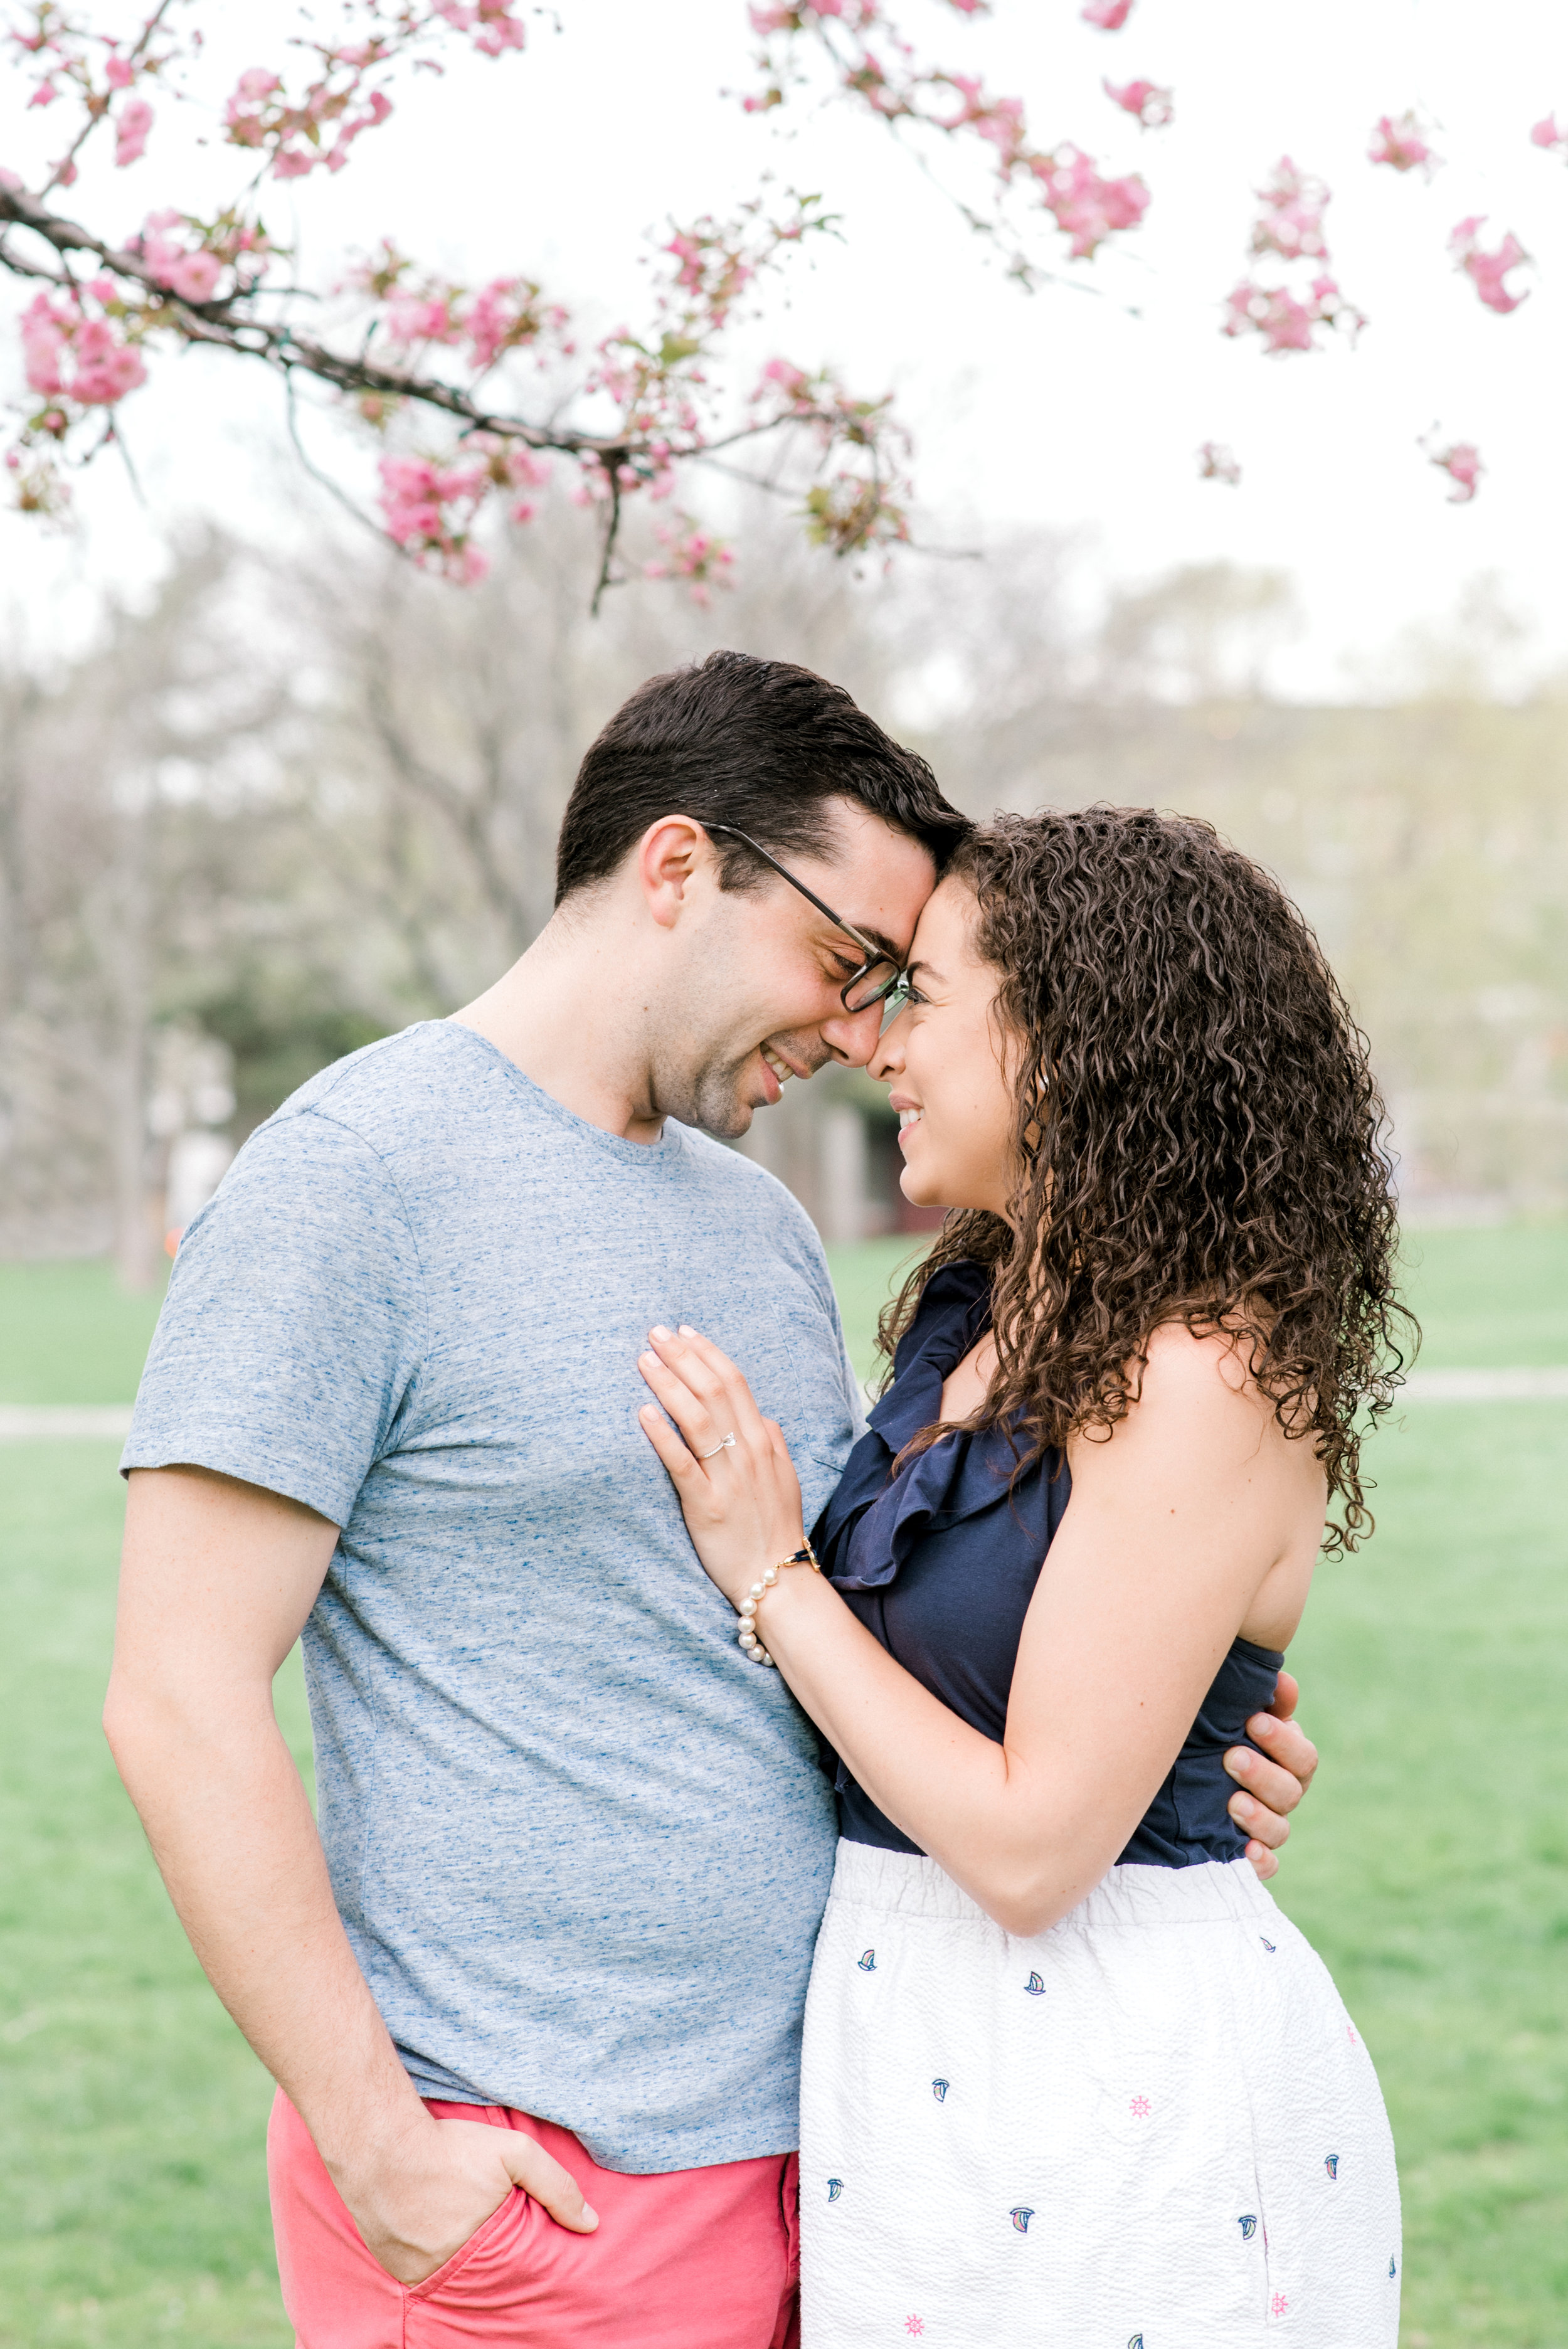 Brianna-and-Brian-engagement-2018-104.jpg